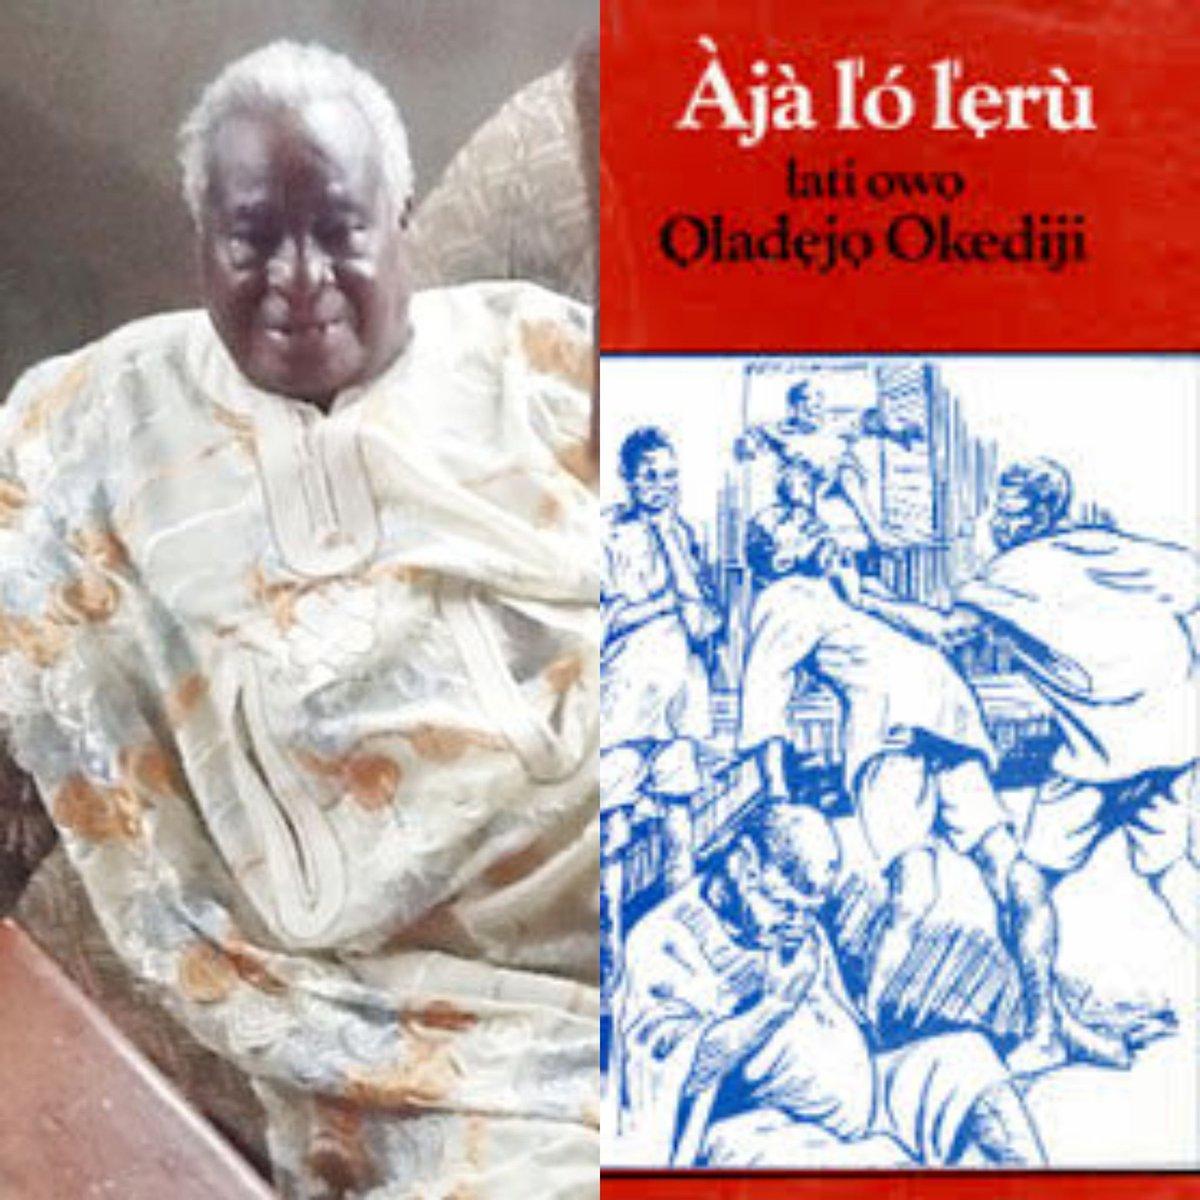 Oladejo Okediji - Veteran Yoruba author, Oladejo Okediji dies aged 89